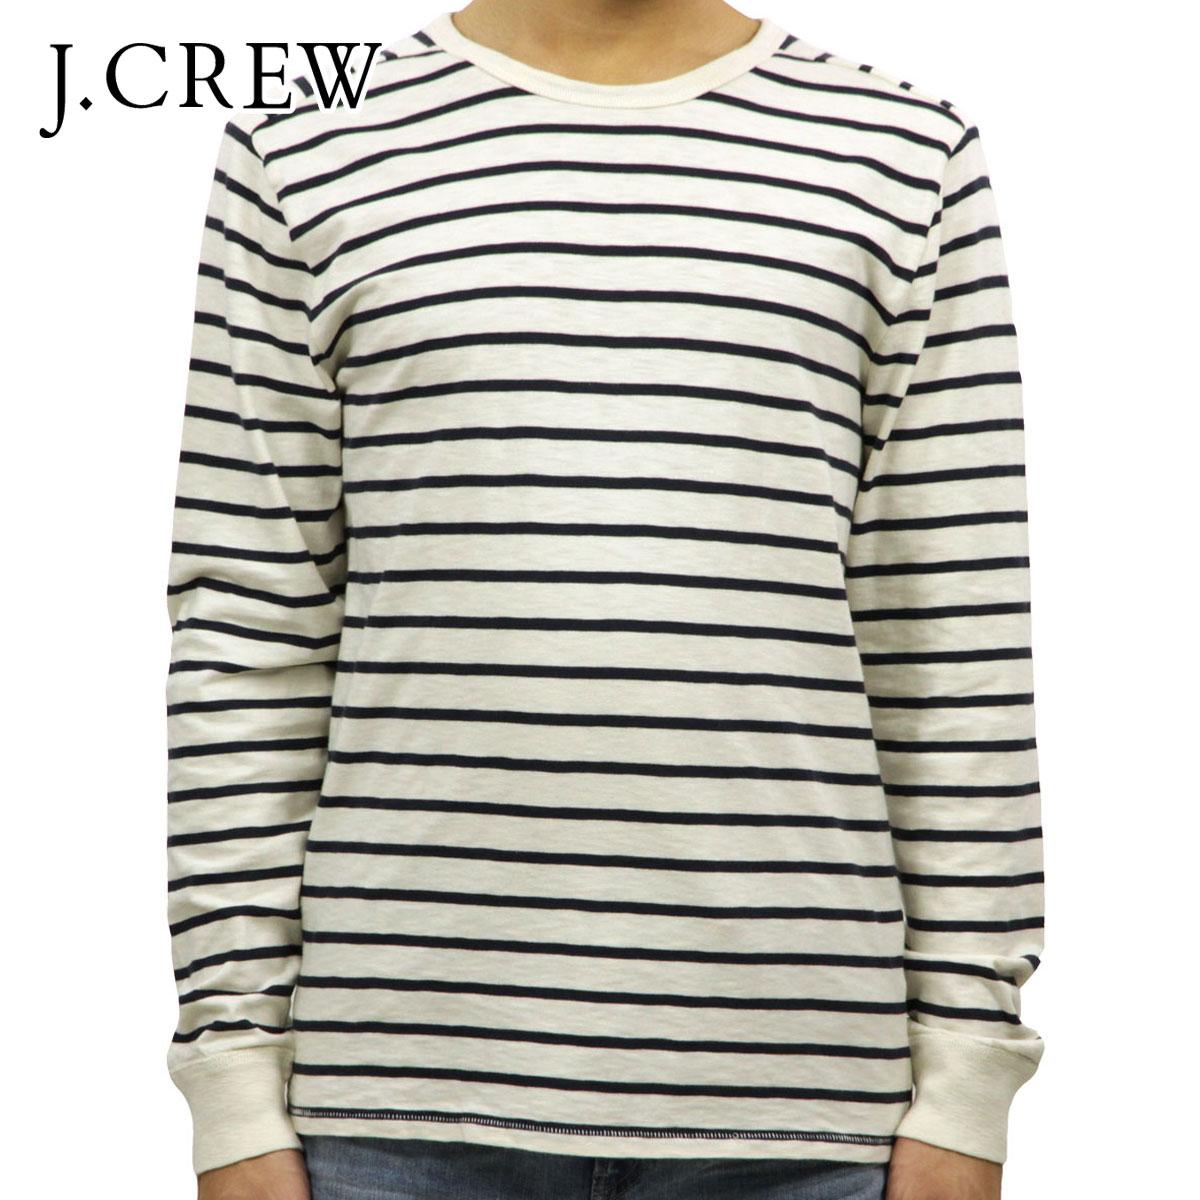 ac497772e0cc3 J.crew J.CREW AE men s long sleeve T shirt LONG-SLEEVE DECK-STRIPED  TEXTURED COTTON T-SHIRT c793120P05Nov16